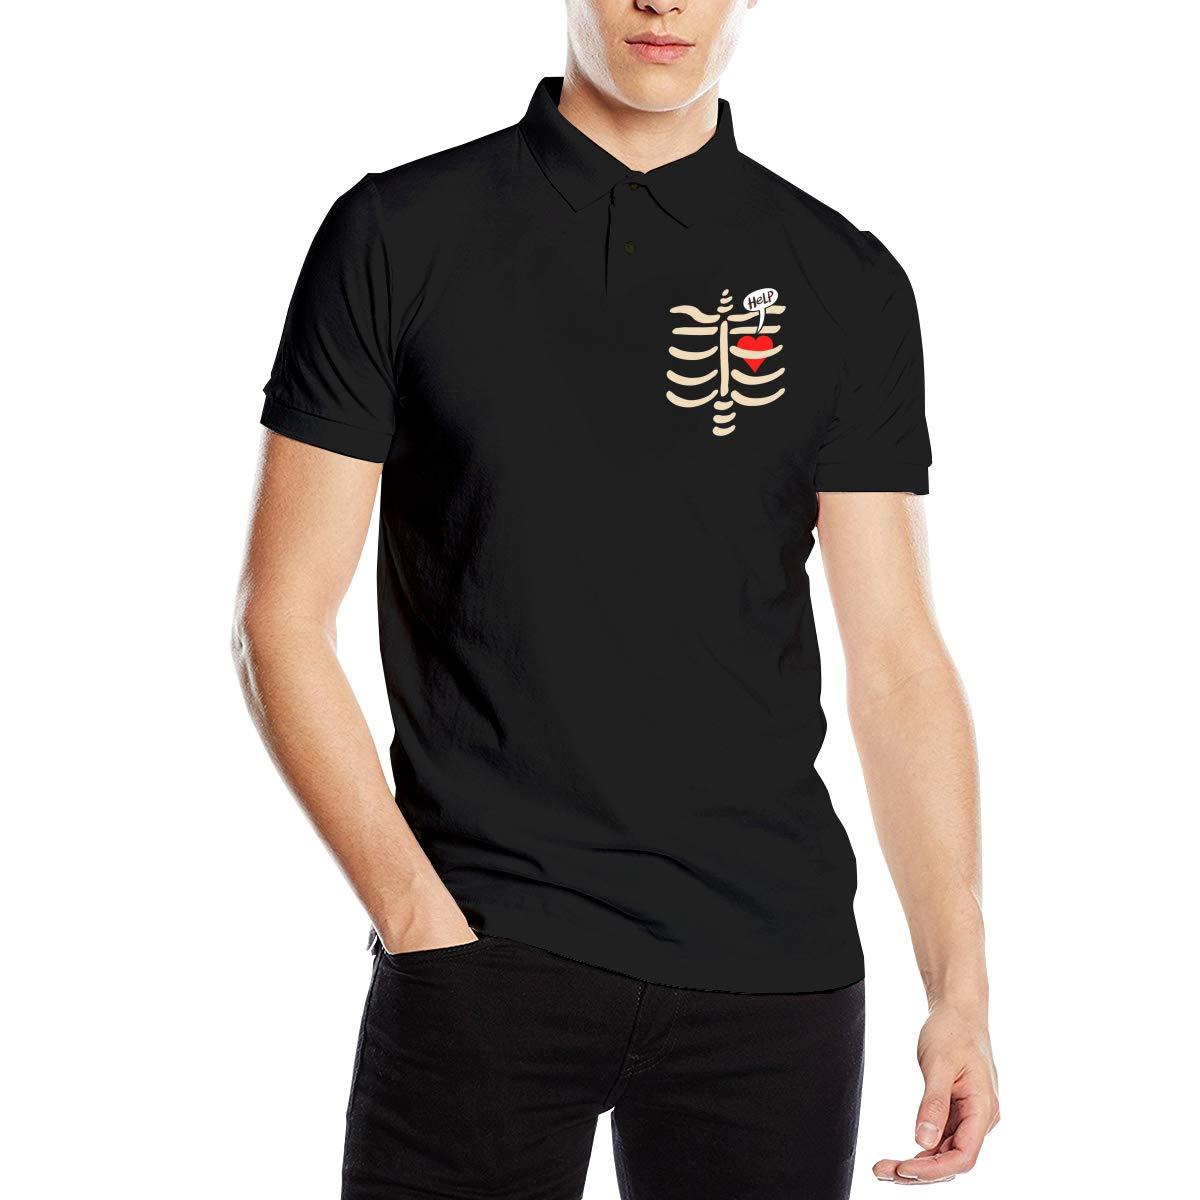 Cjlrqone Help Mens Comfortable Polo Shirts M Black